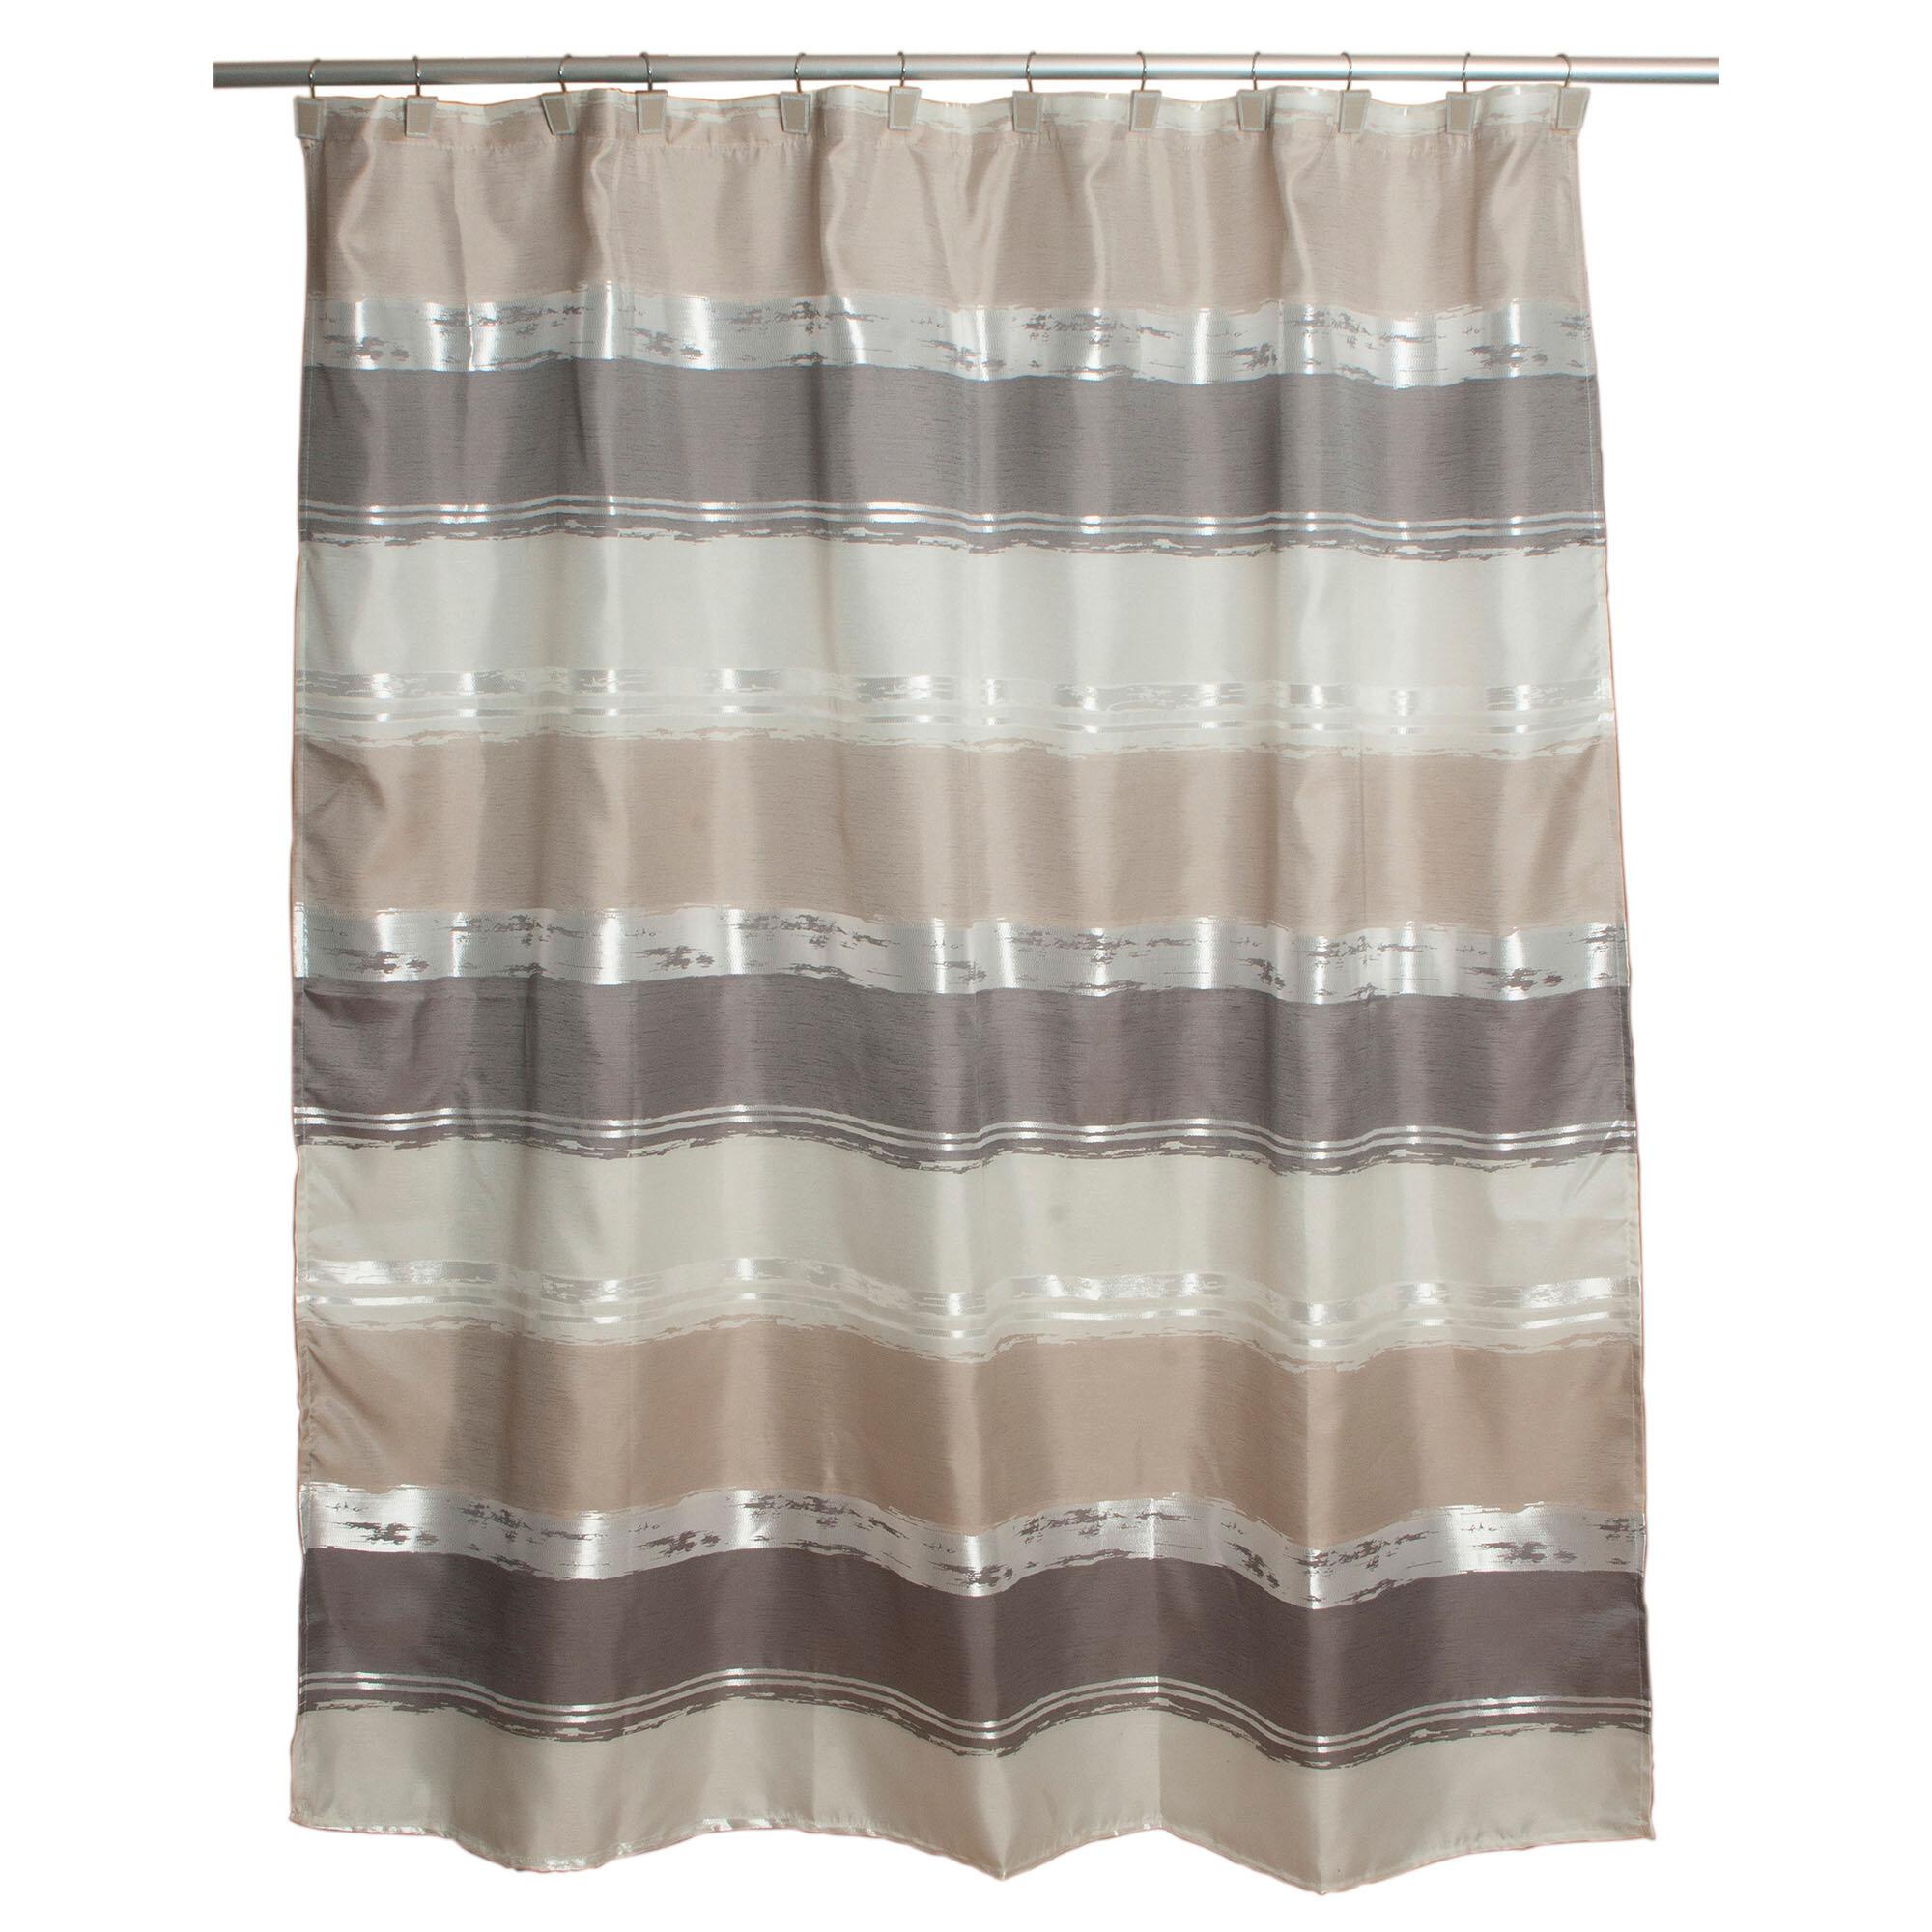 Mercer41 Isbell Single Shower Curtain Reviews Wayfair